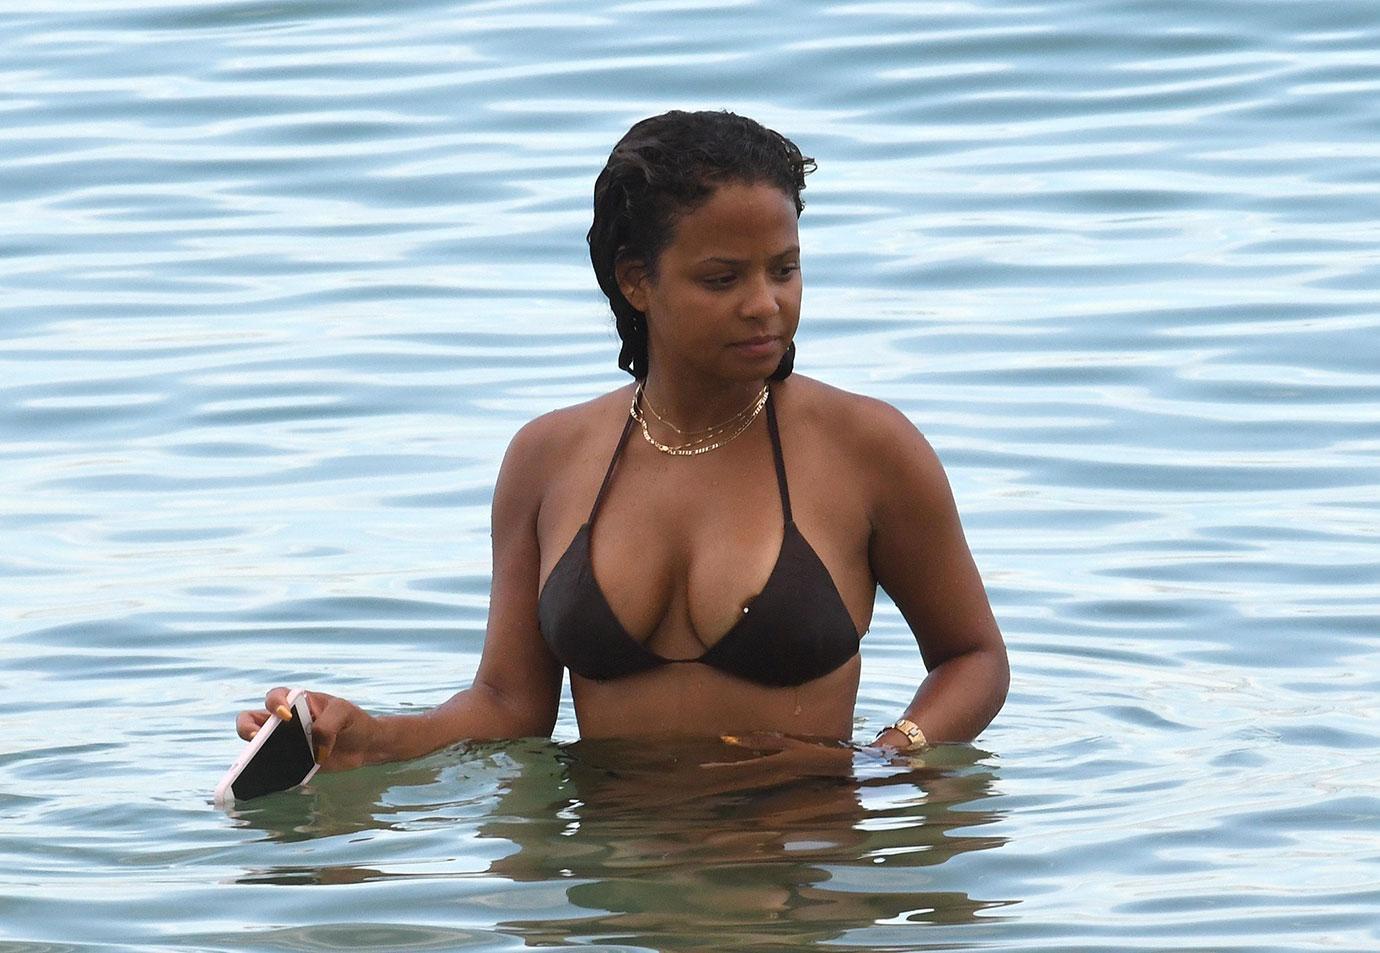 Christina milian nipple